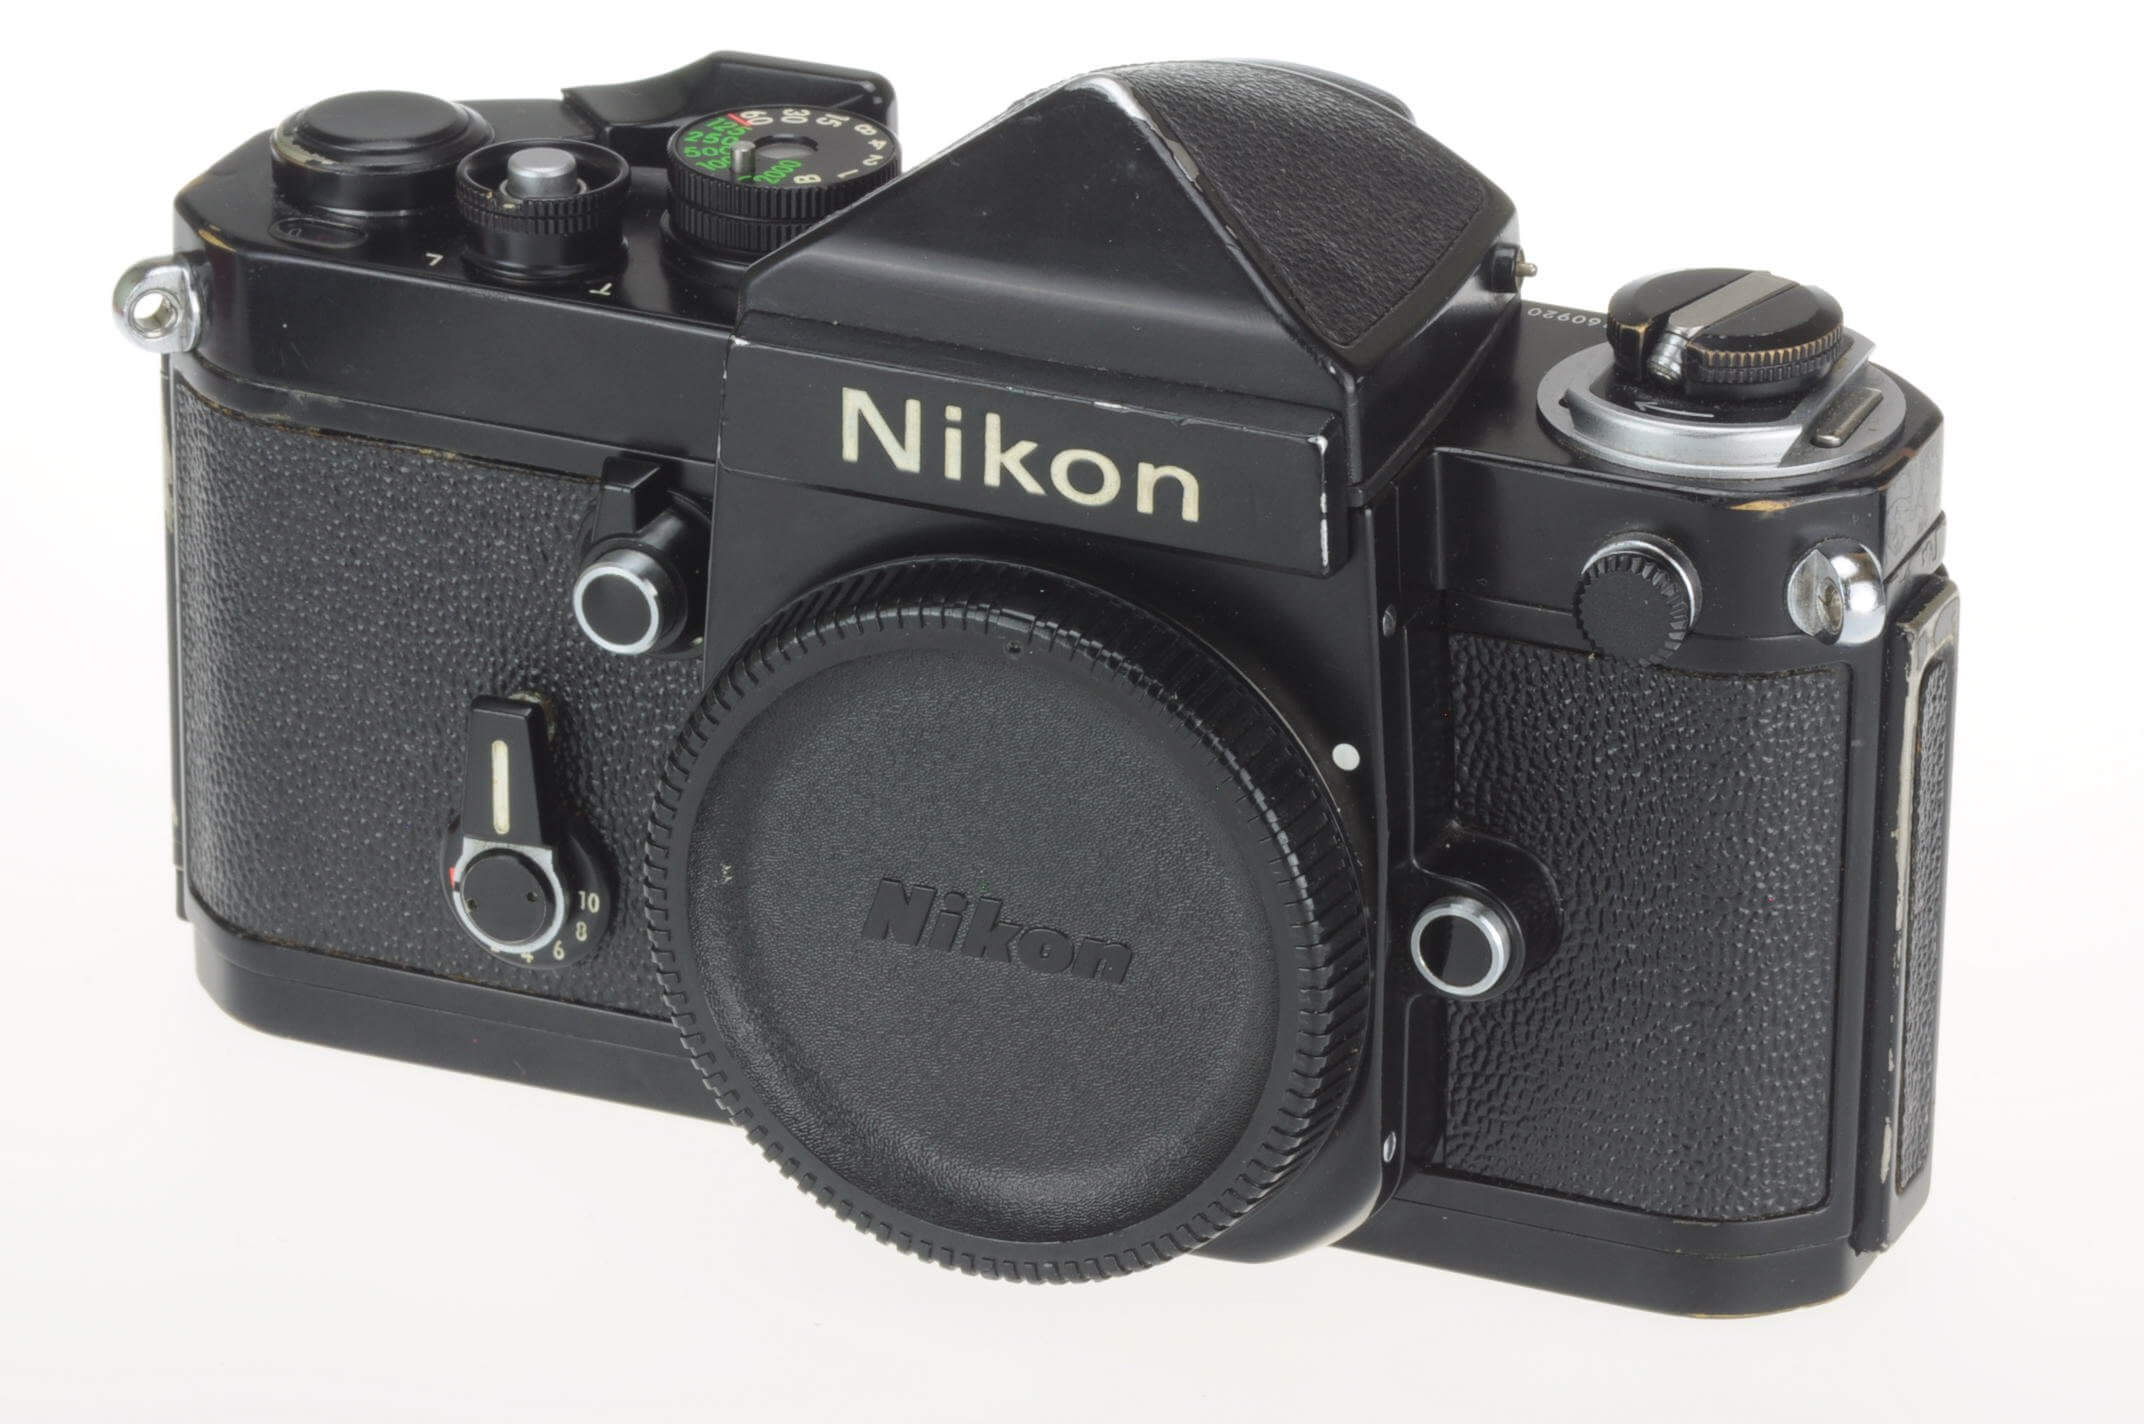 Nikon F2 body with DE1 finder, black, excellent 'user'!